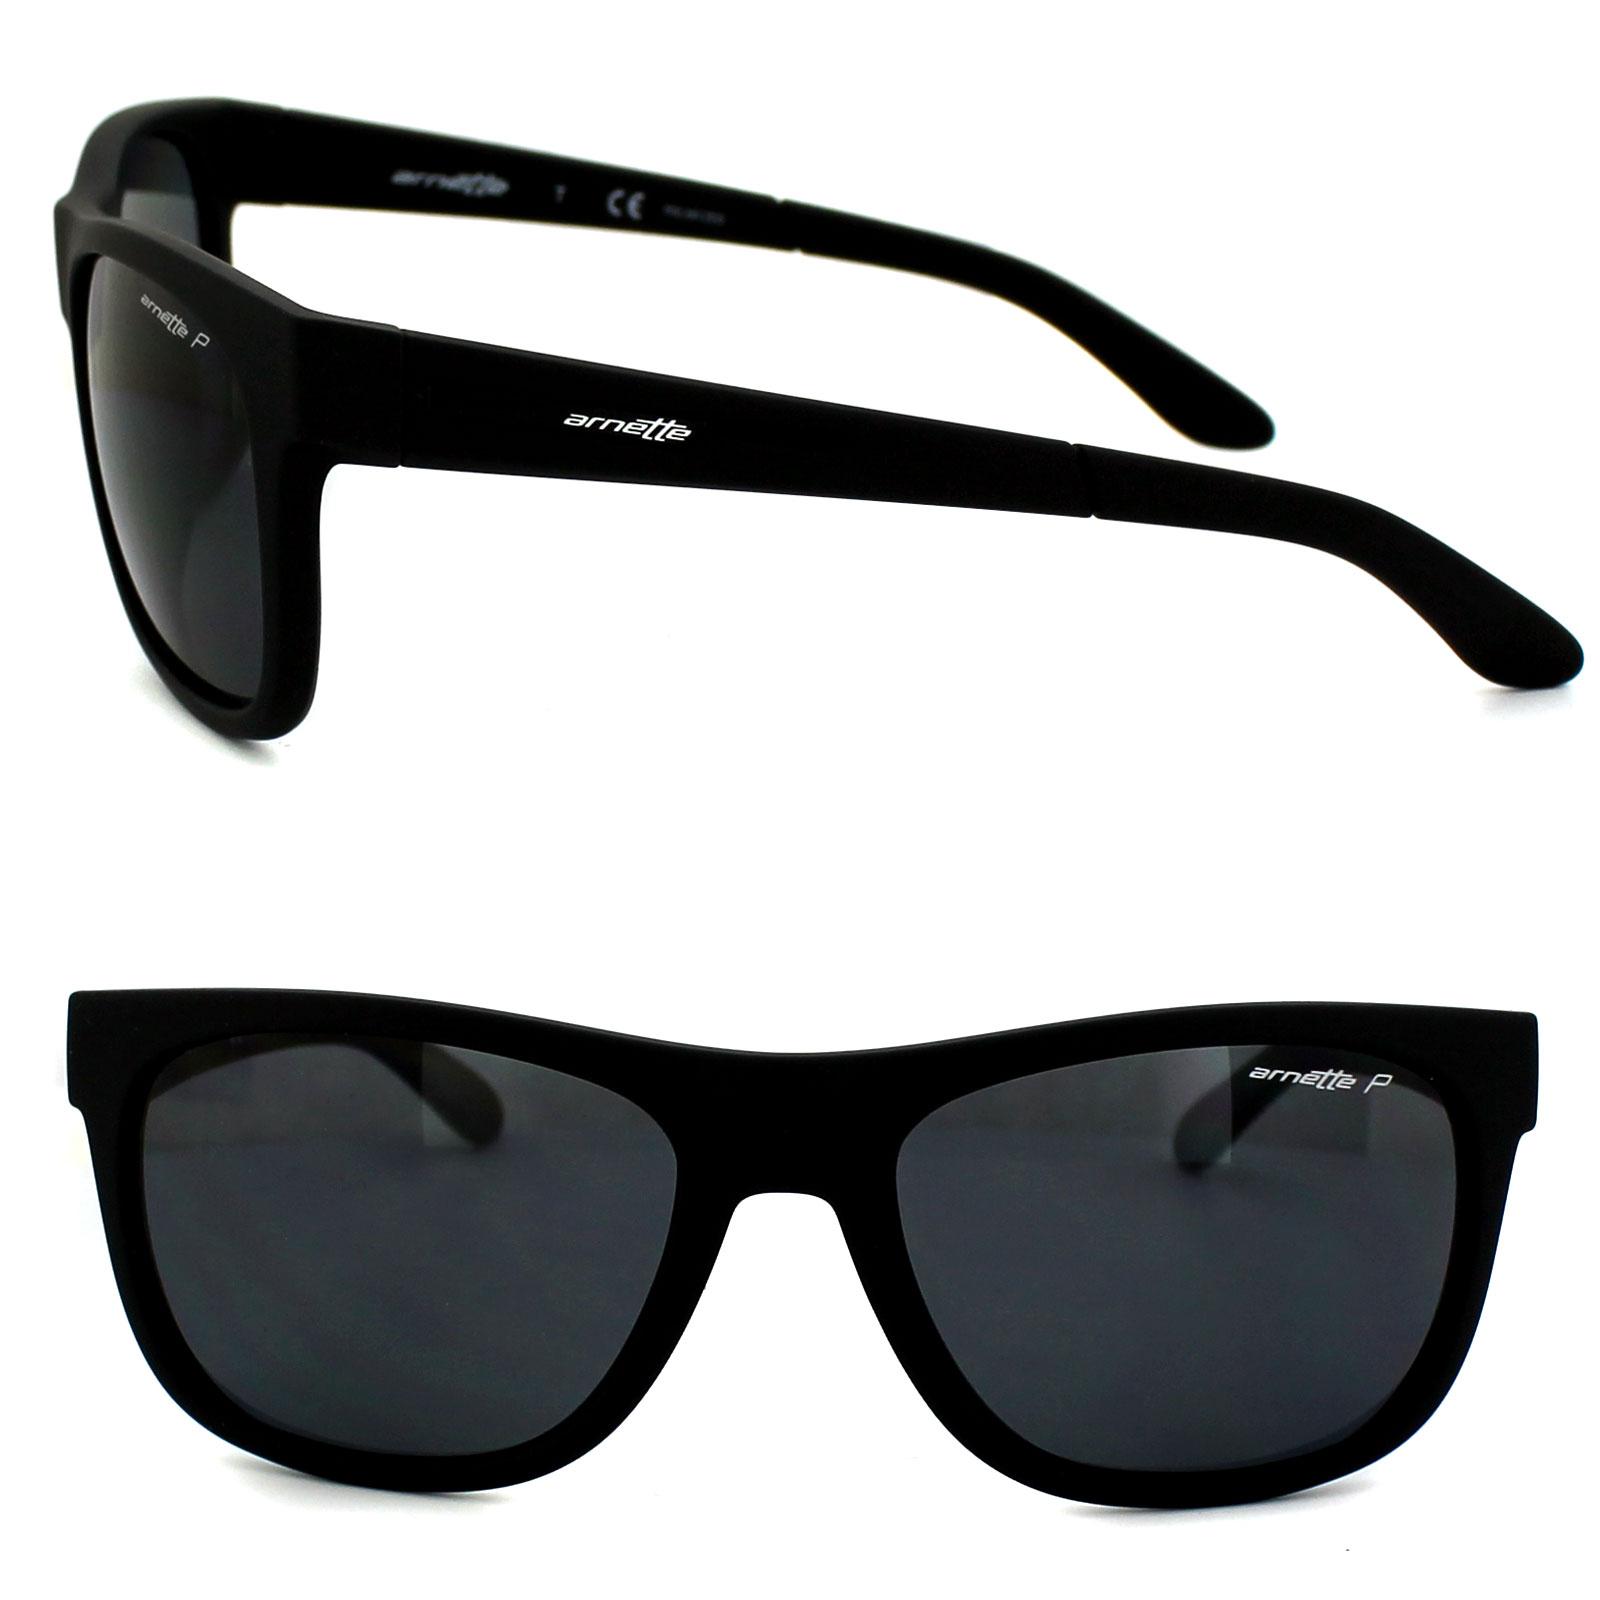 7dd28f84d2 Details about Arnette Sunglasses 4206 Fire Drill Lite 447 81 Fuzzy Black  Grey Polarized